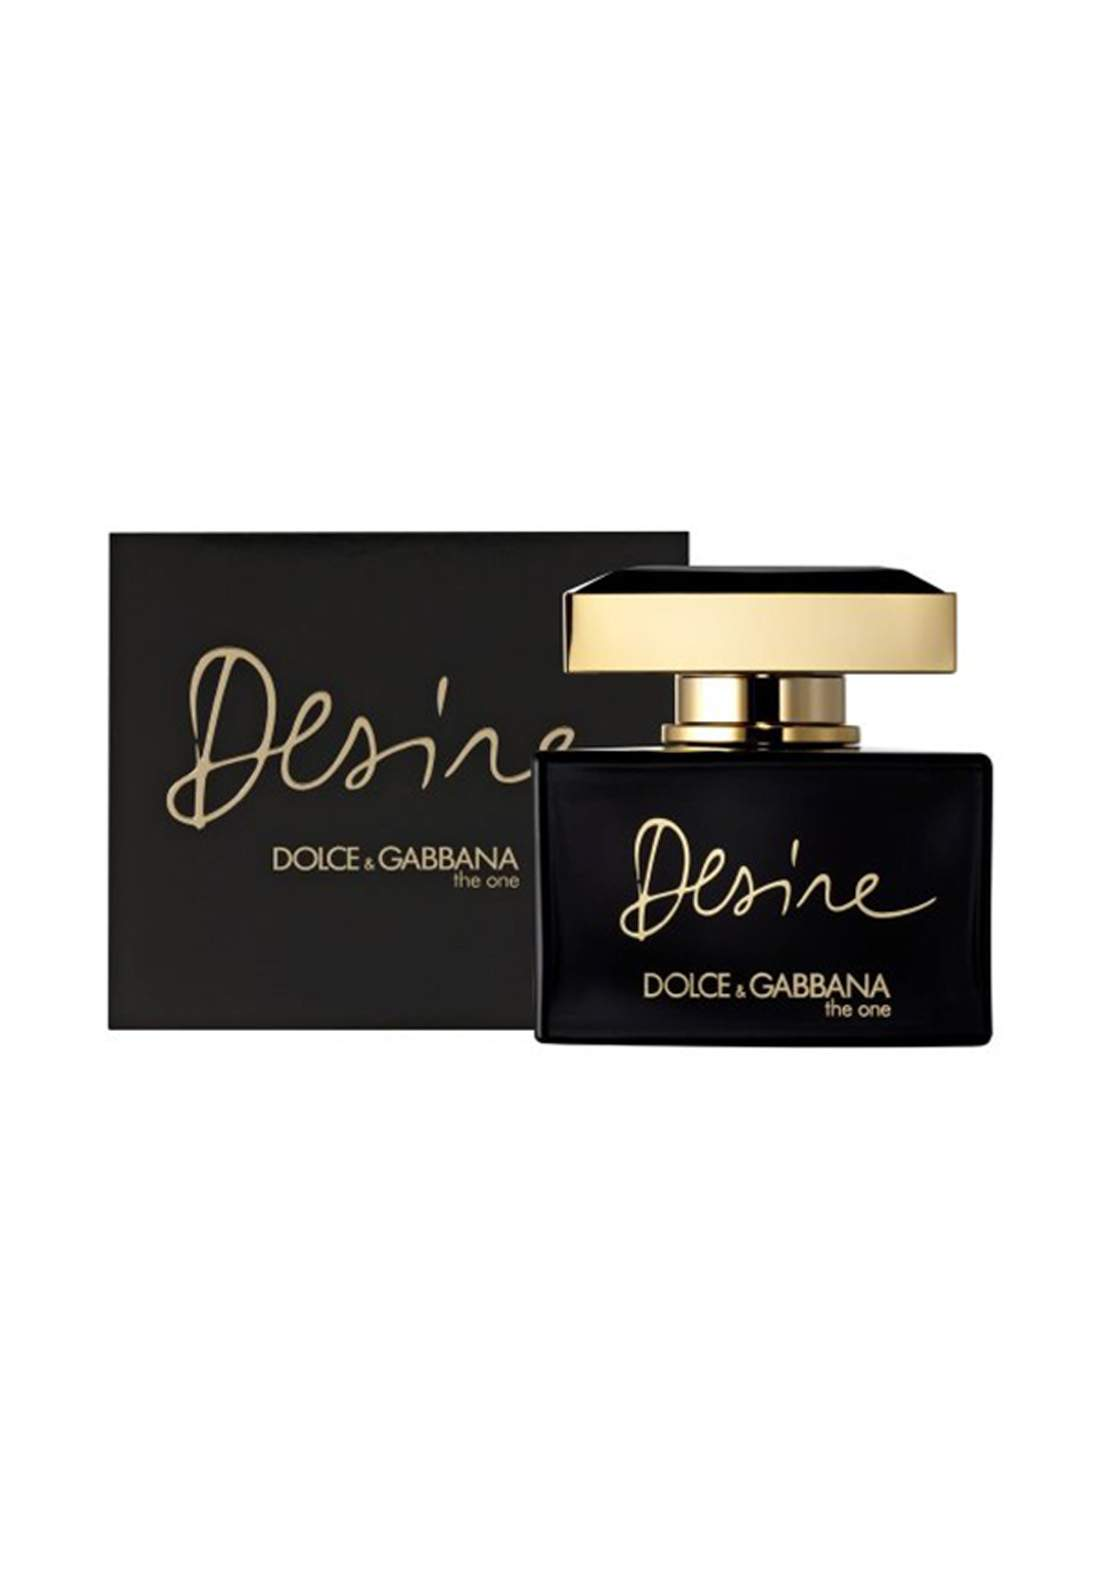 Dolce Gabbana The One Desire EDP For Women 75ml عطر نسائي